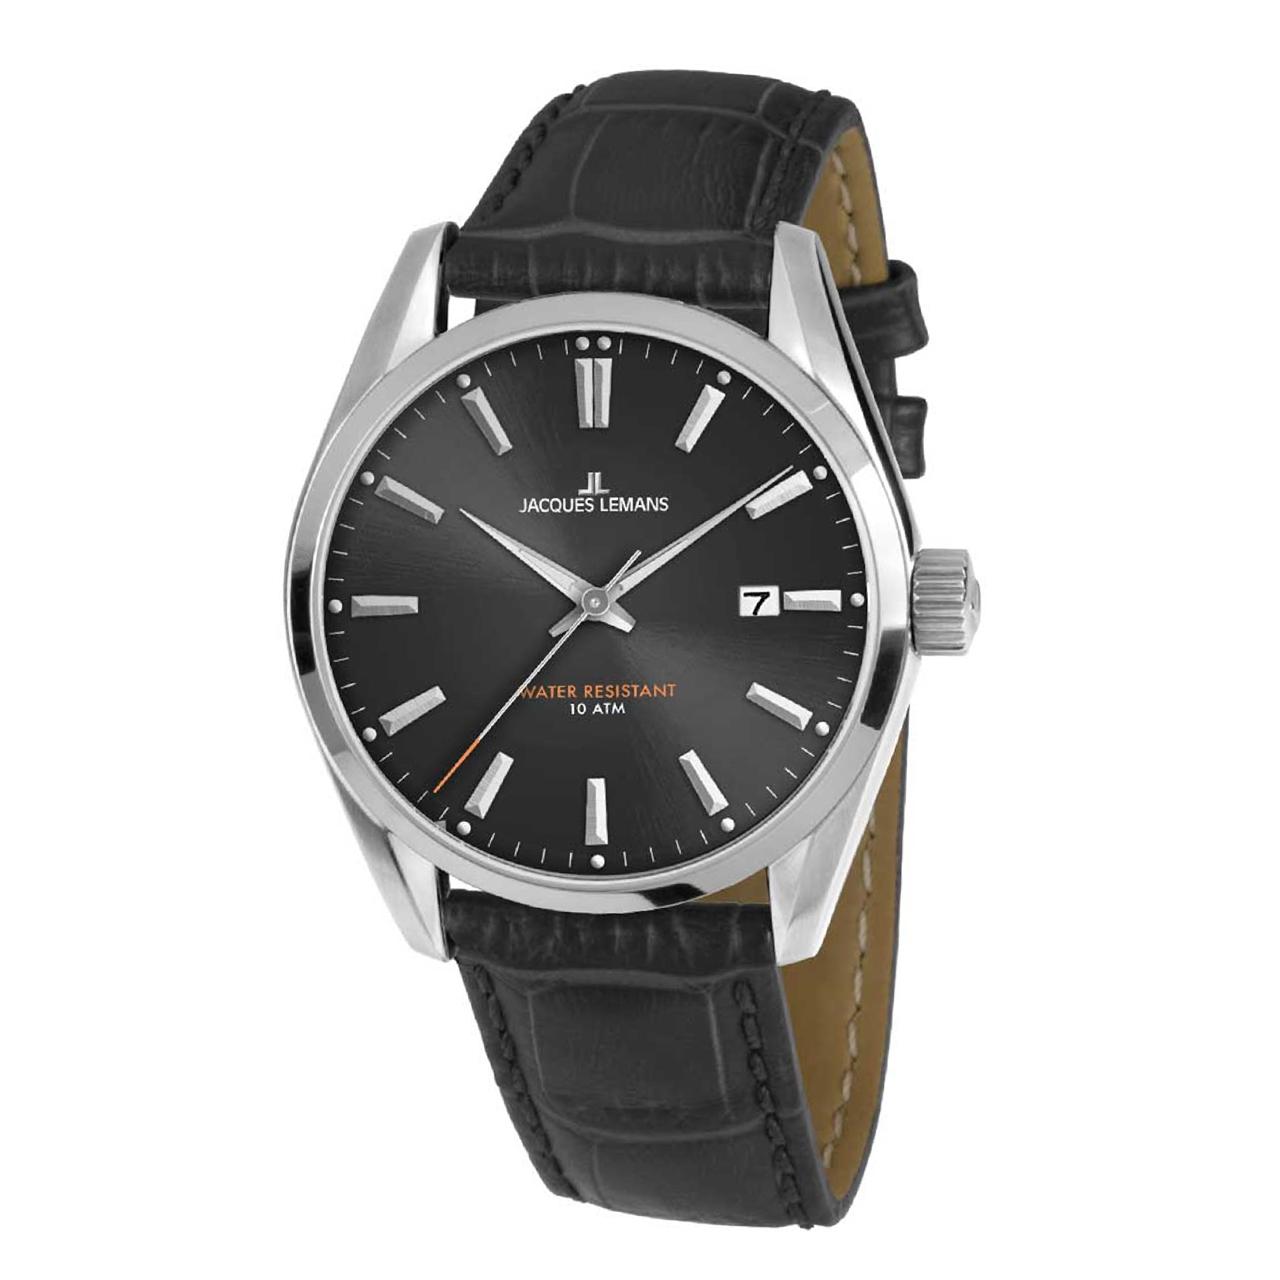 ساعت مچی عقربه ای ژاک لمن مدل 1-1859A